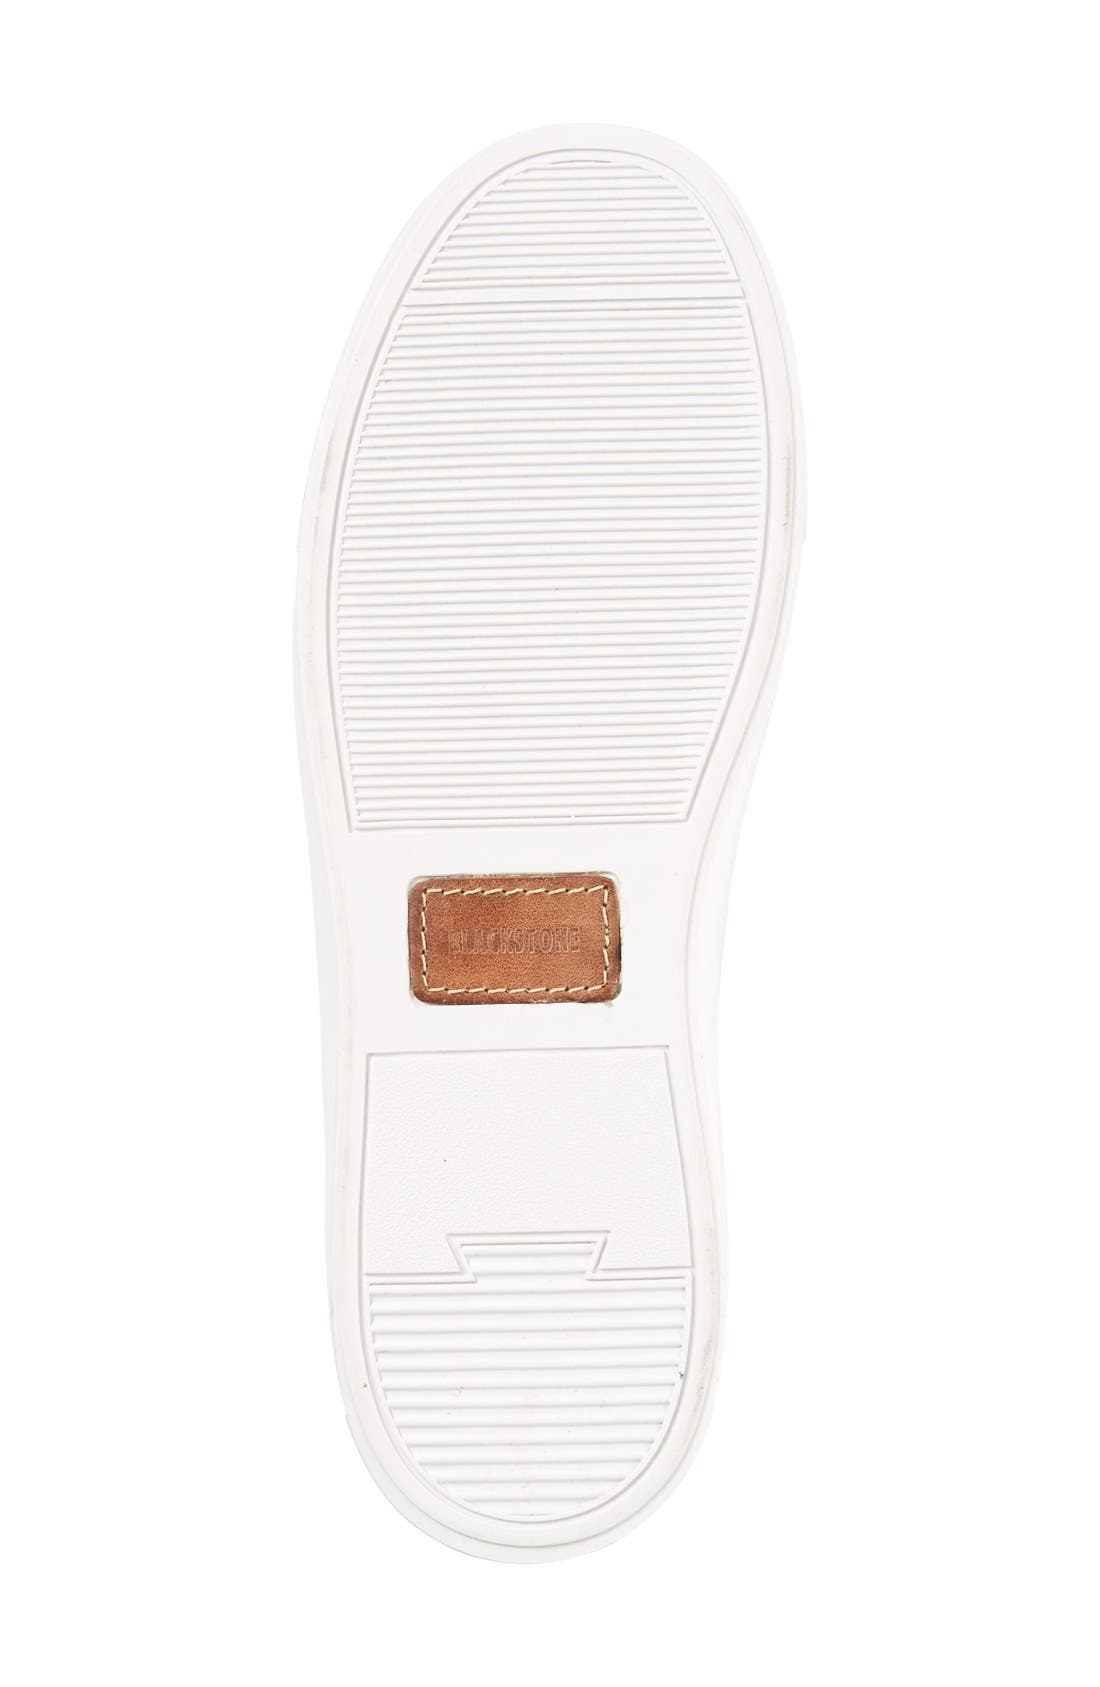 BLACKSTONE, 'LL60' Midi Sneaker, Alternate thumbnail 4, color, WHITE LEATHER